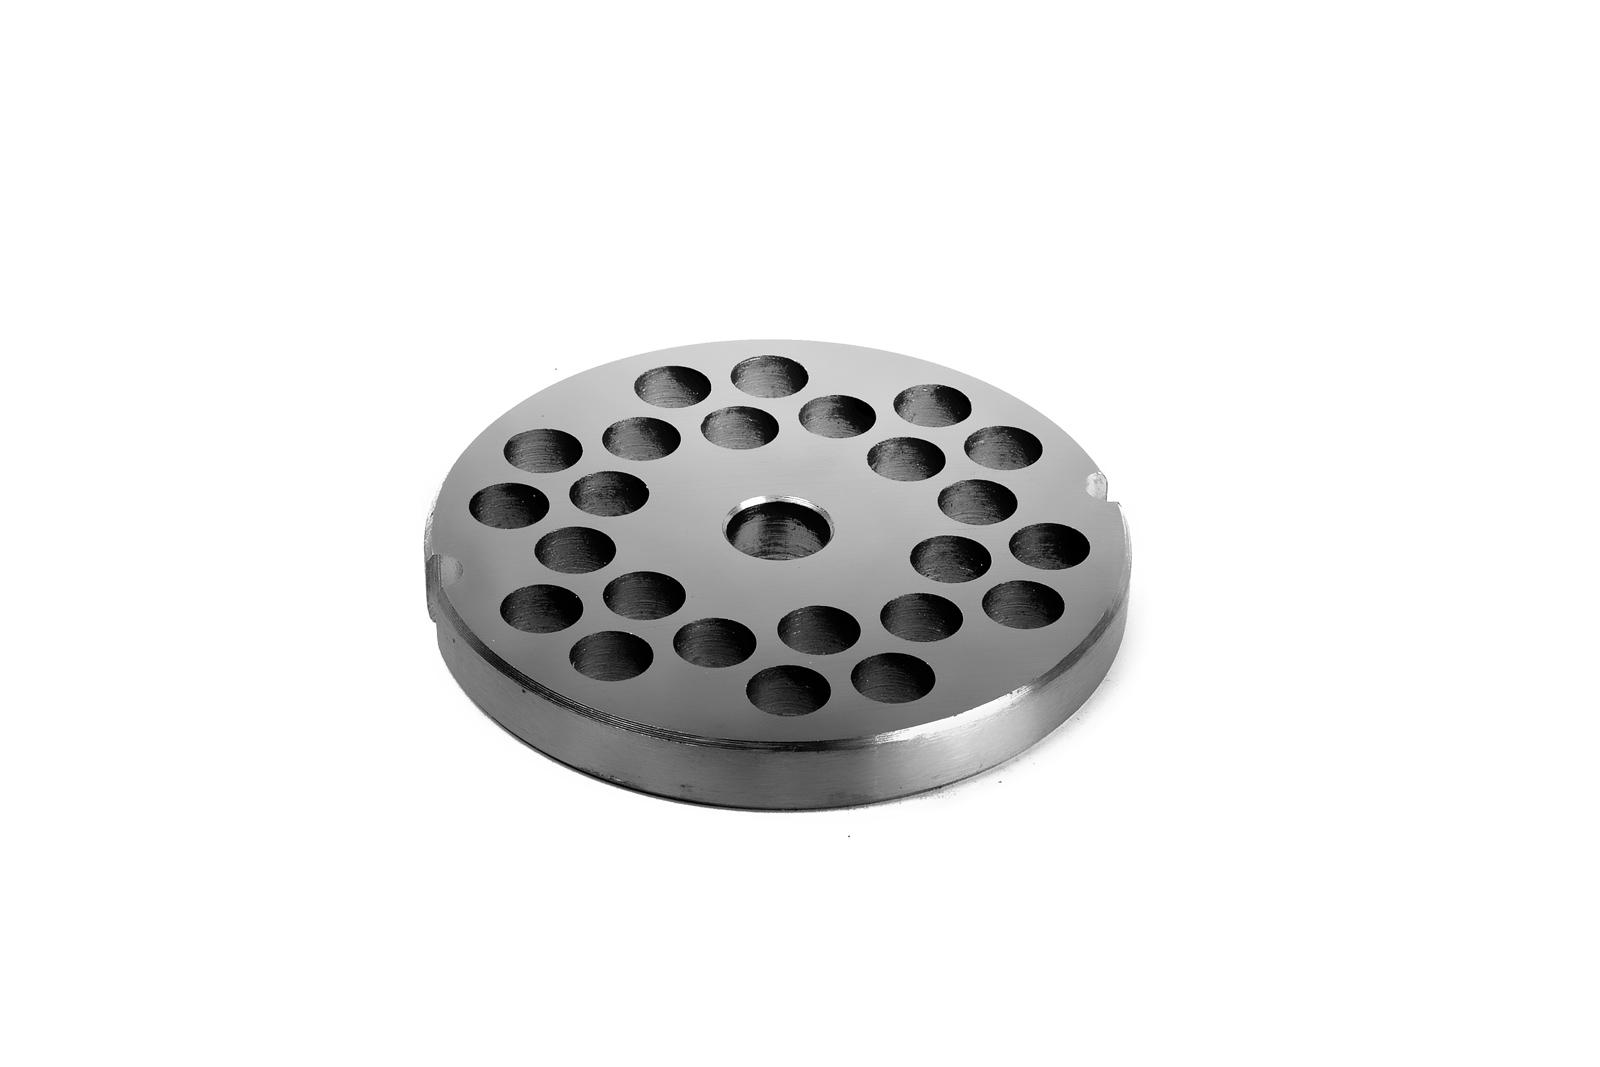 Piastra per Tritacarne 12 - Fori da 8 mm - Tre Spade